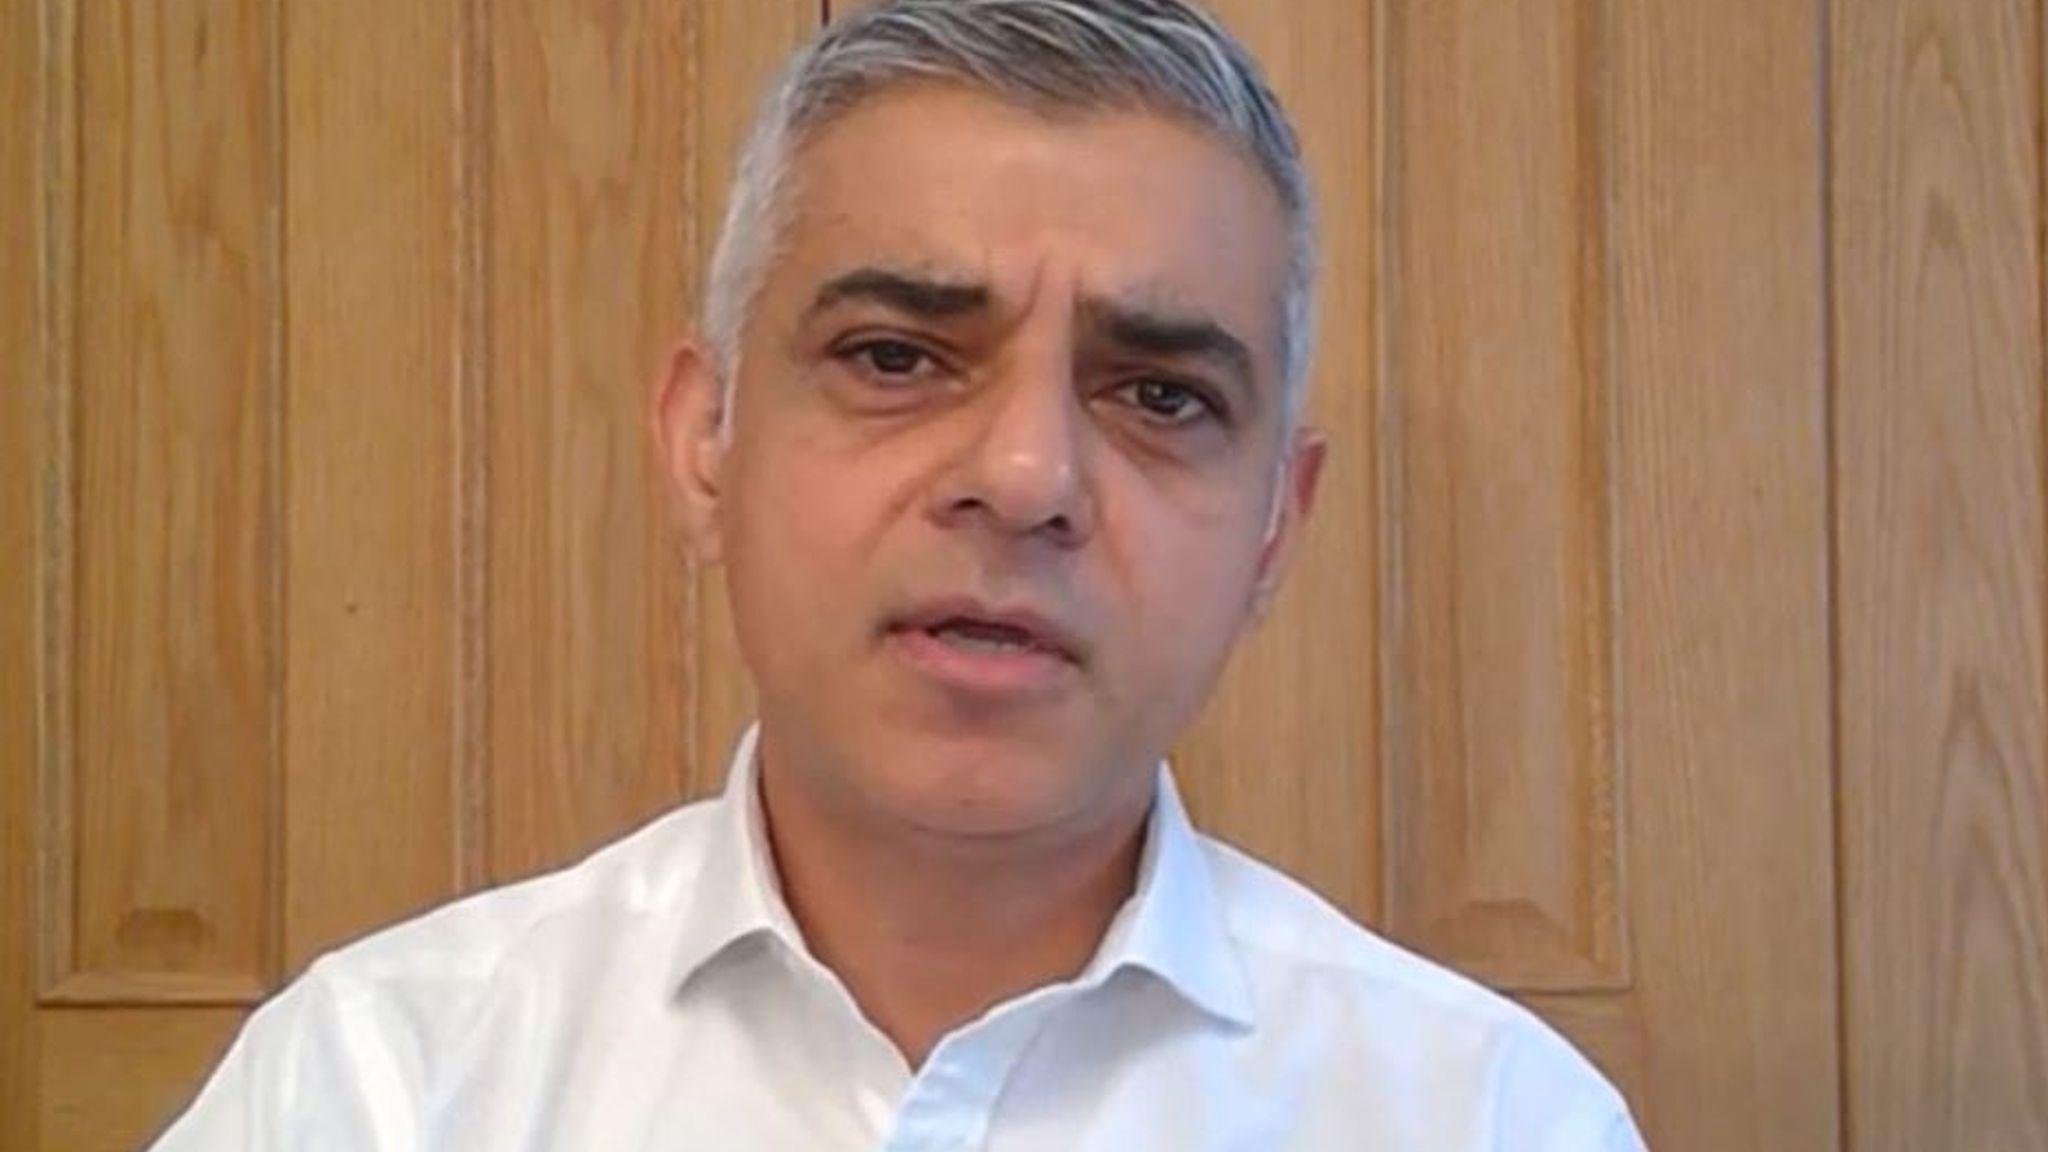 Sadiq Khan says London is 'not ready' for local lockdowns